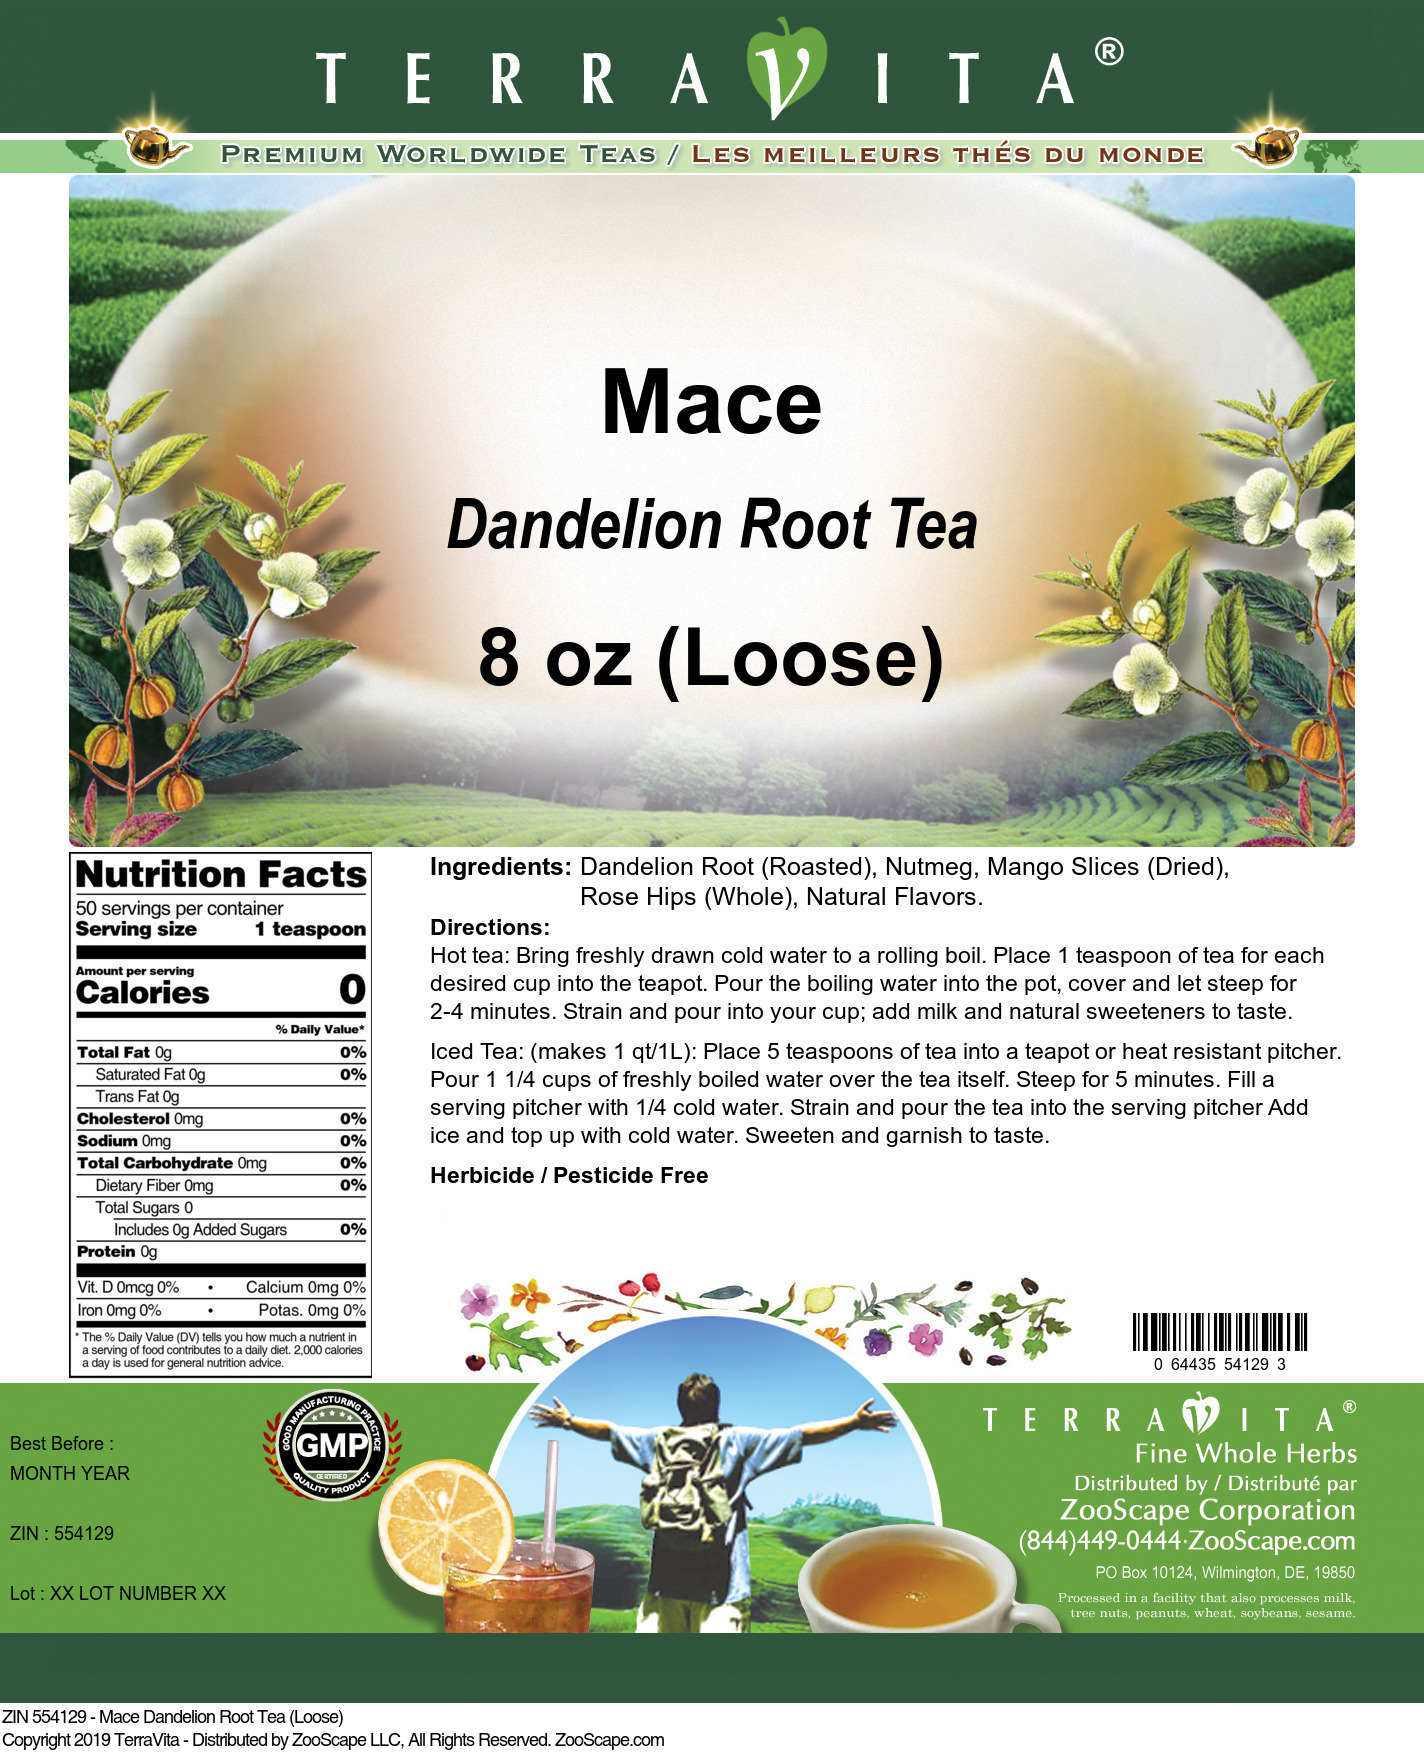 Mace Dandelion Root Tea (Loose)